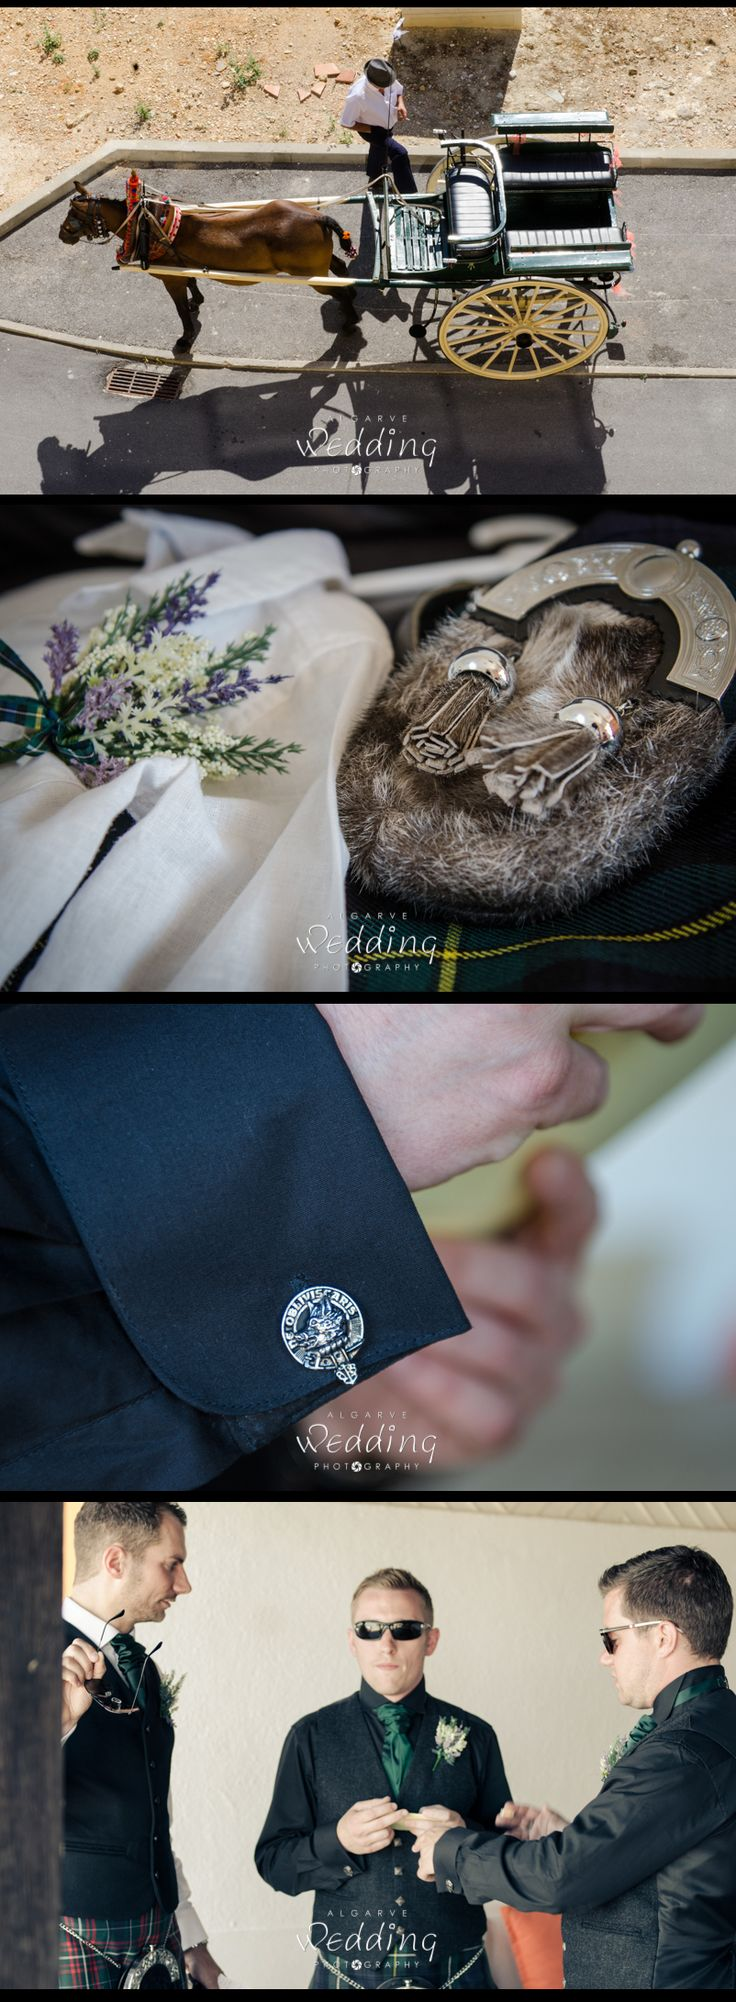 #weddingsalgarve #weddings #tivoli #beach #beachwedding #lagosweddings #portugalweddings